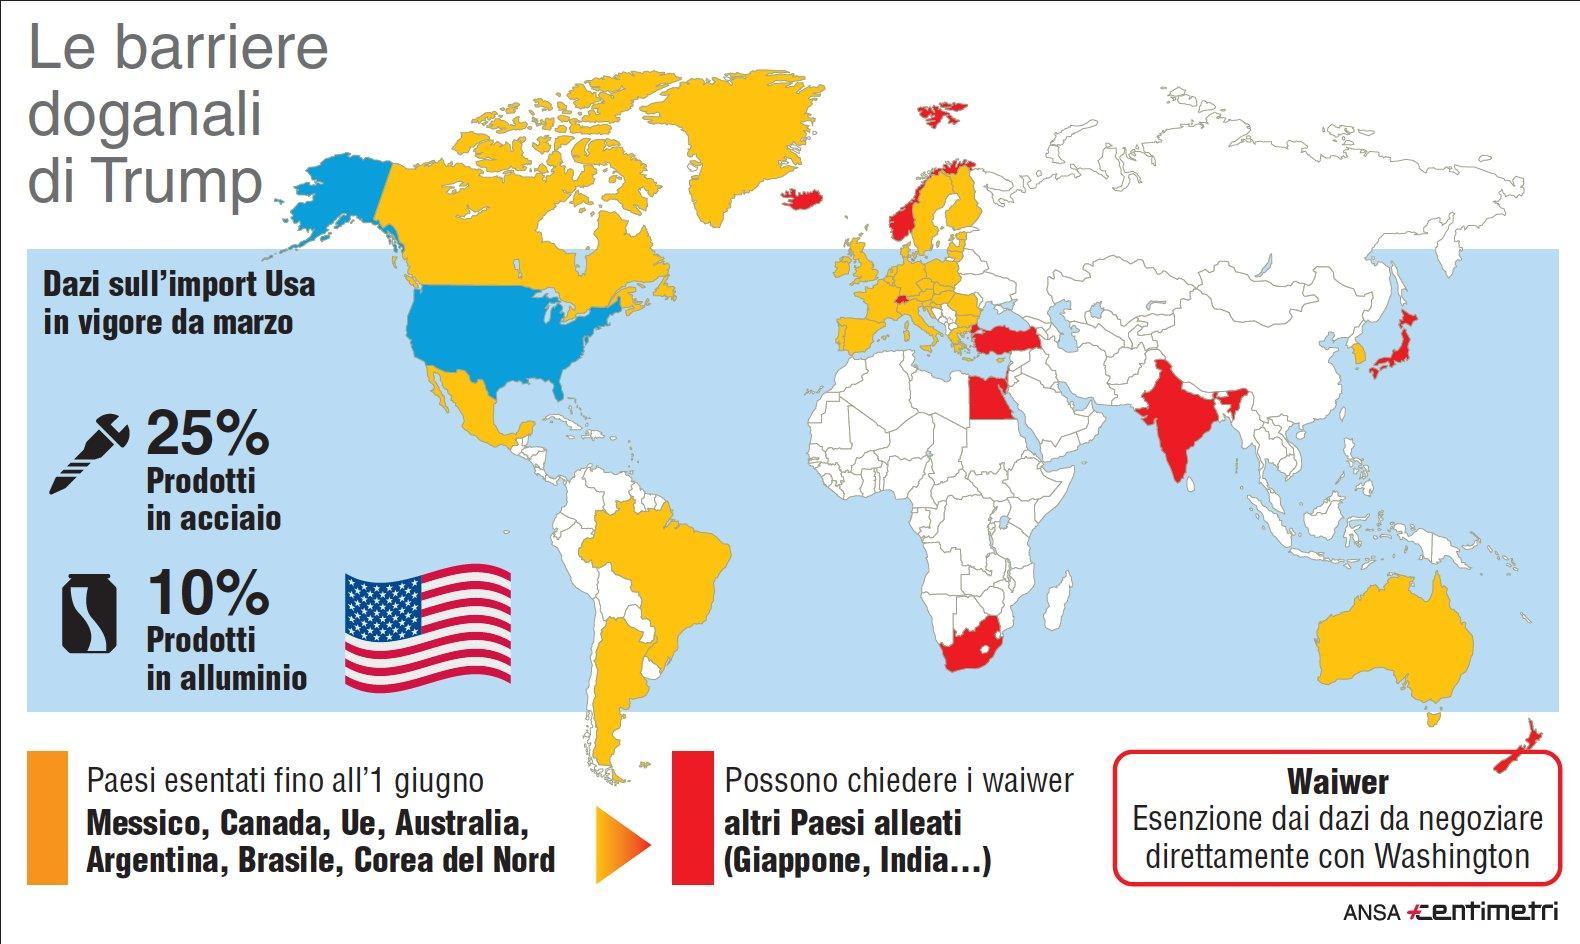 Dazi Usa, i Paesi colpiti dal provvedimento